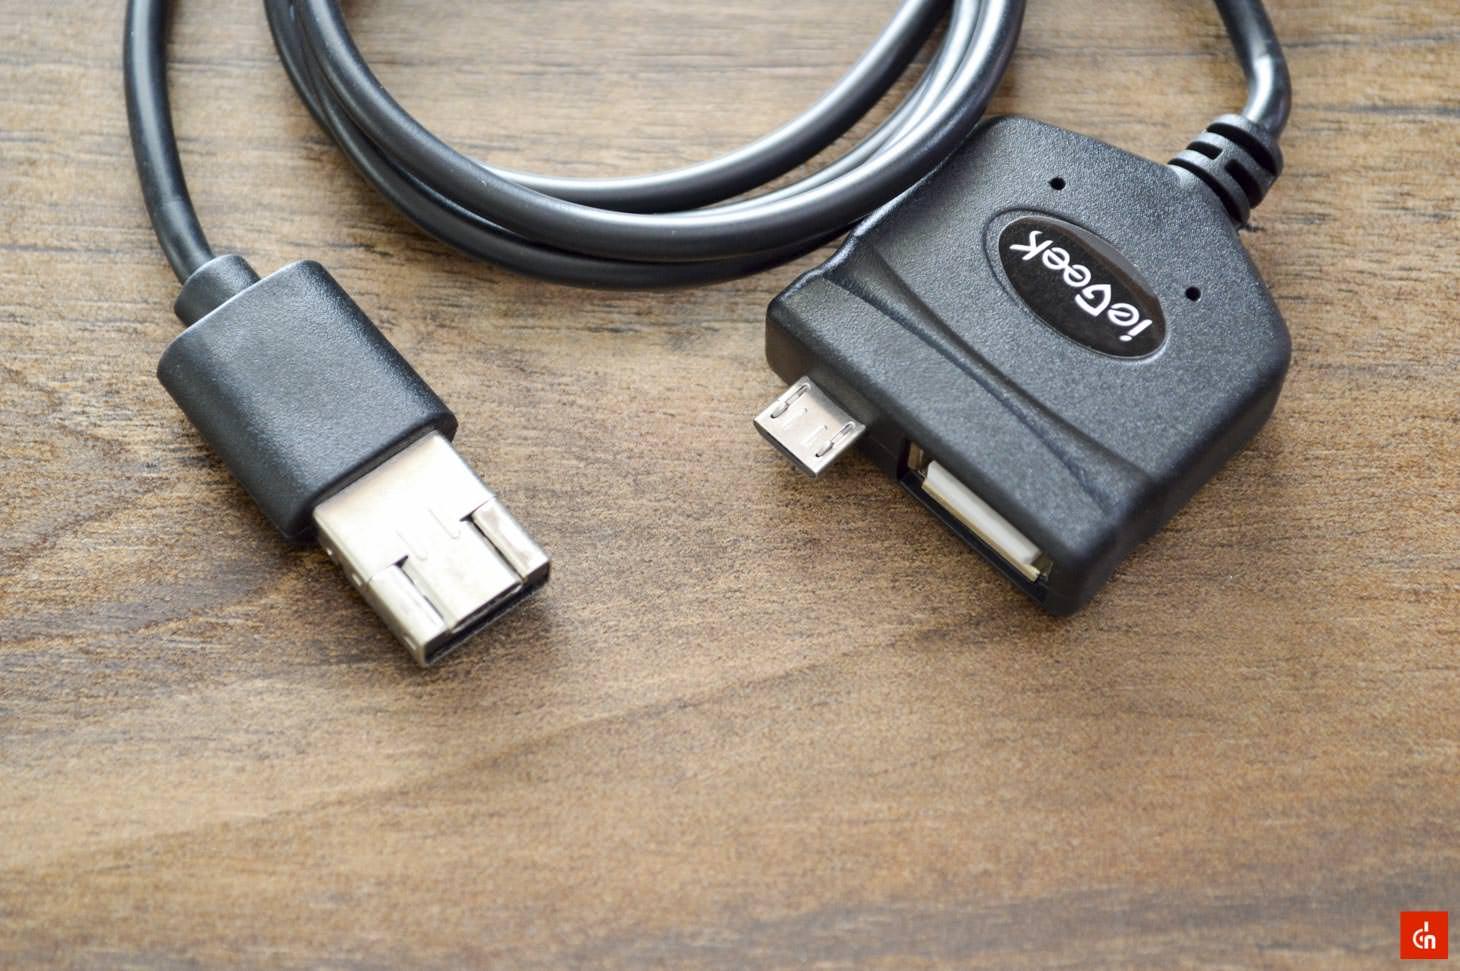 003_20160718_iegeek-u-multi-usb-cable